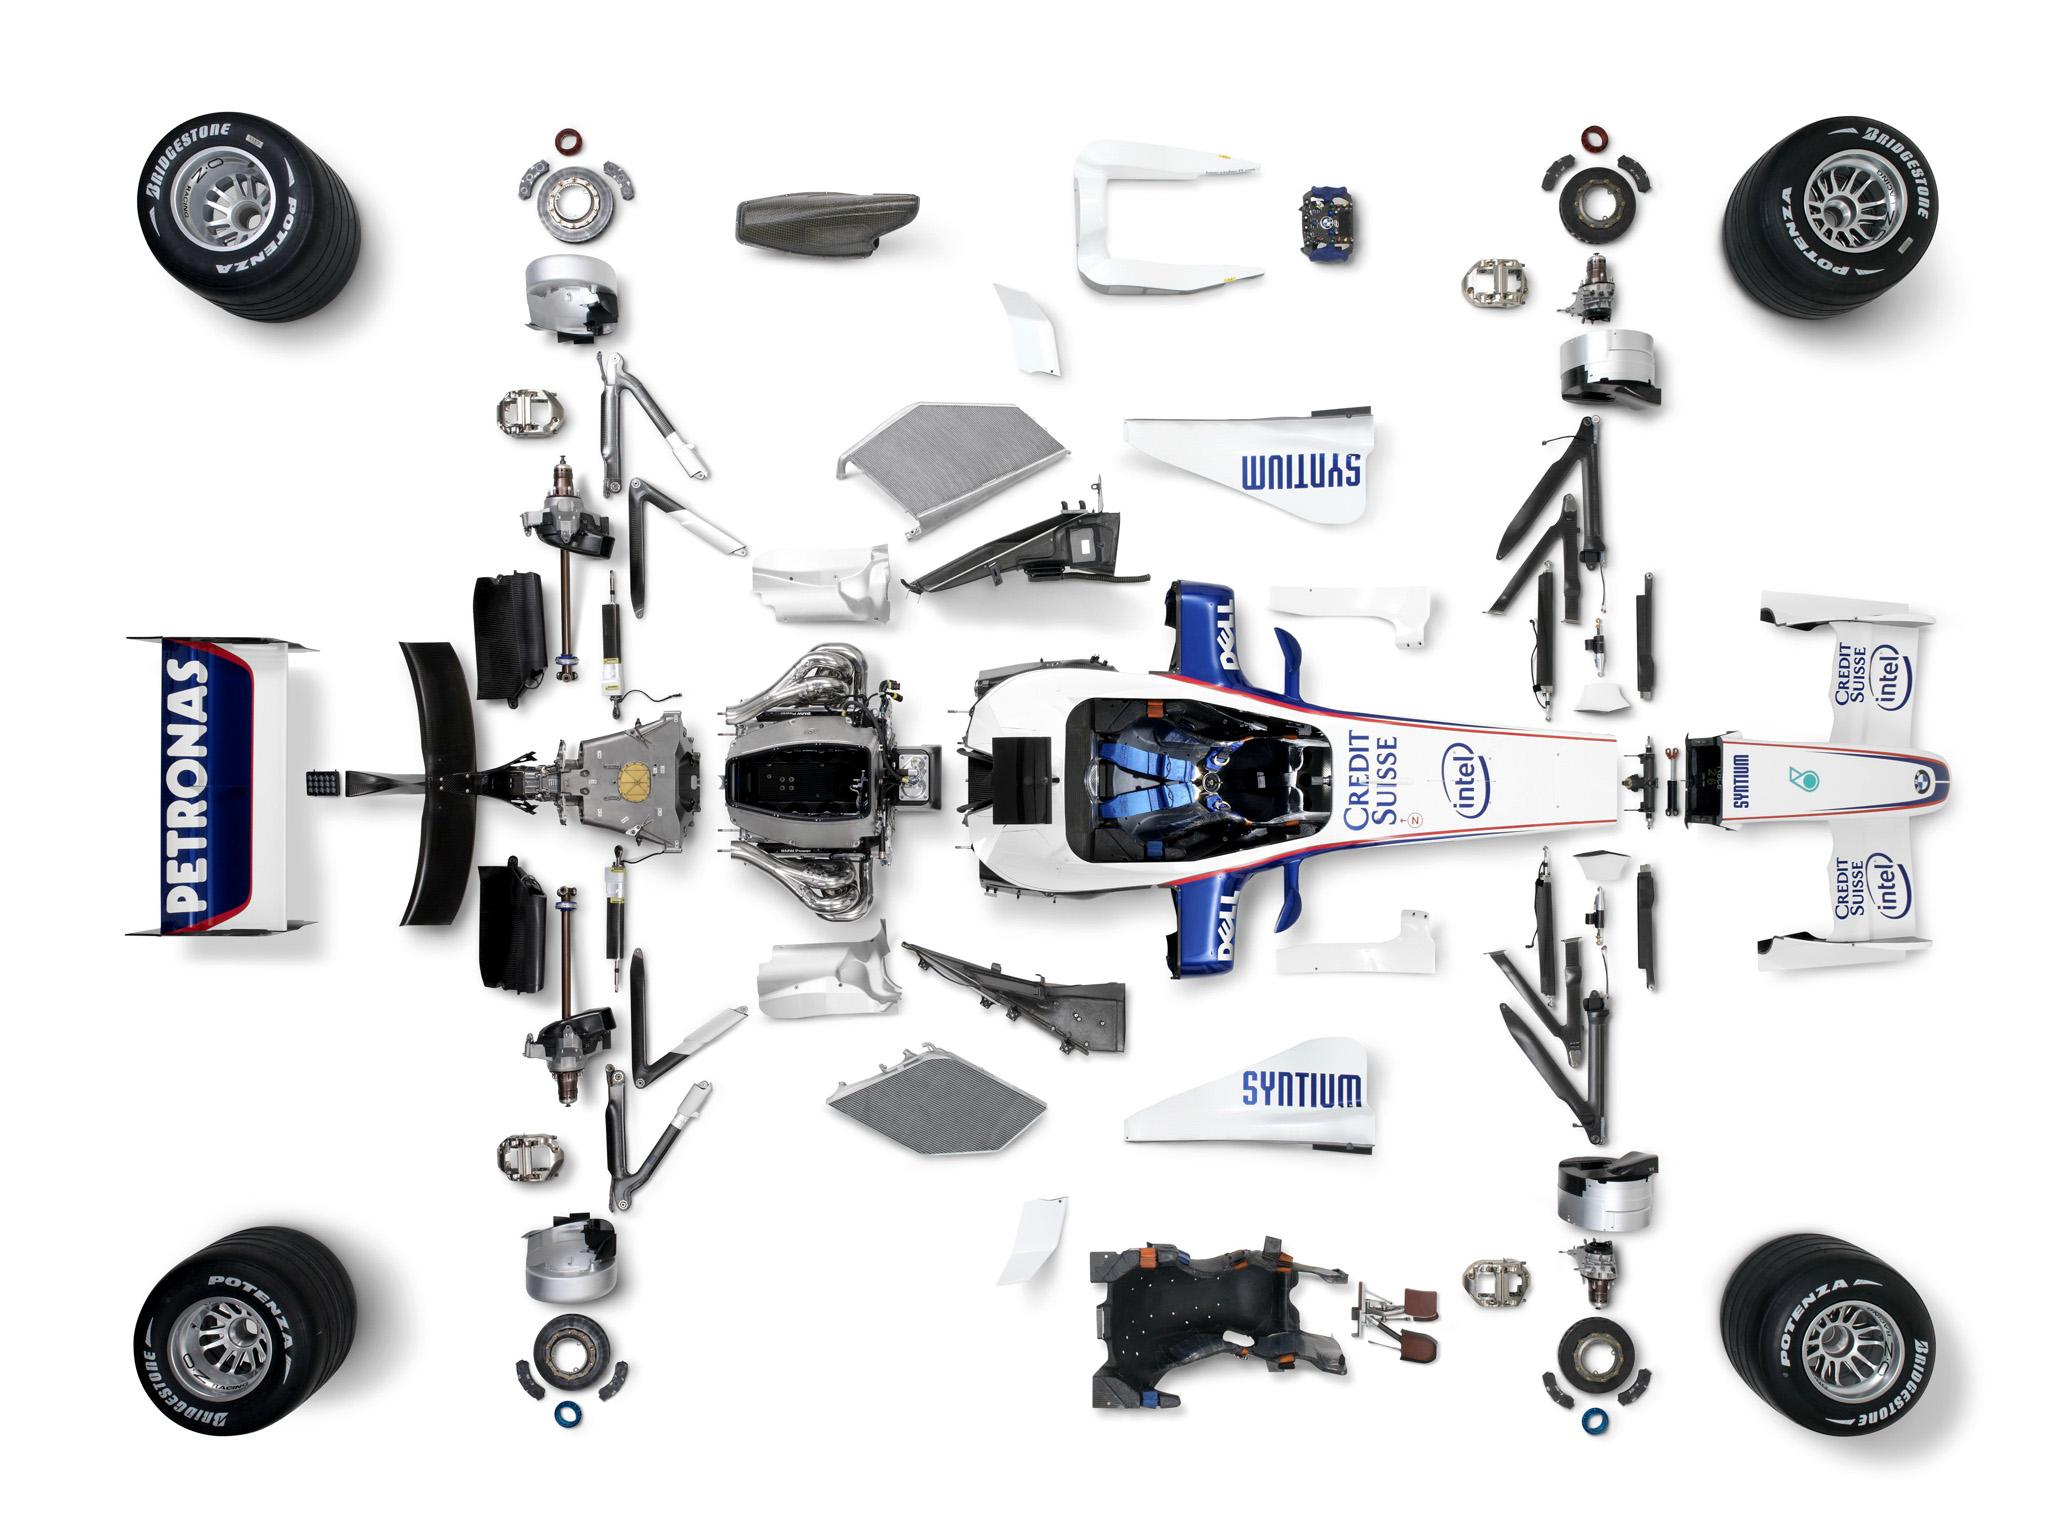 f1 engine wallpaper - photo #42